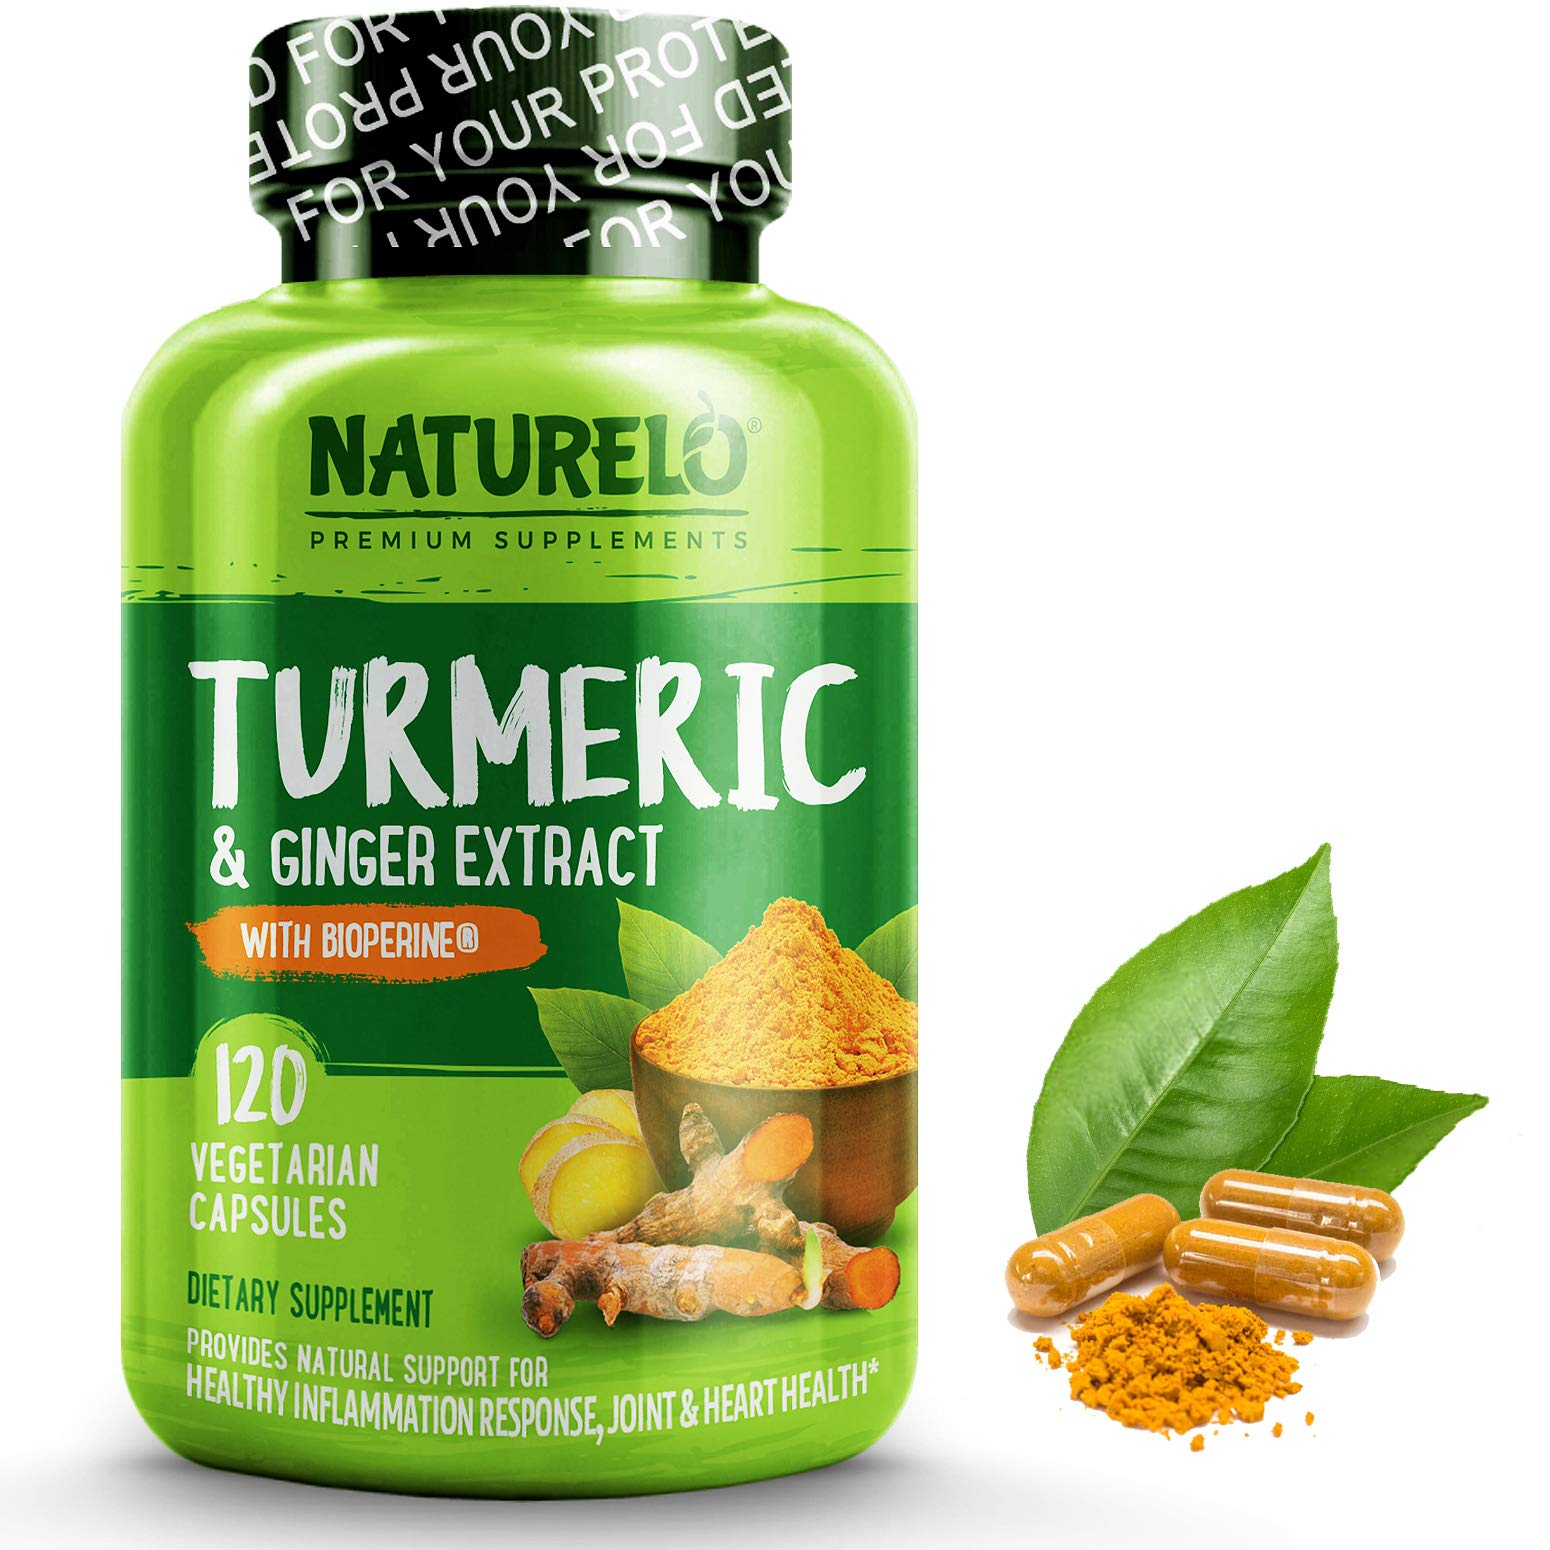 NATURELO Organic Turmeric Curcumin - BioPerine for Better Absorption - 95% Curcuminoids, Natural Black Pepper, Ginger Powder - Anti Inflammatory Supplement for Joint Pain Relief - 120 Vegan Capsules by NATURELO